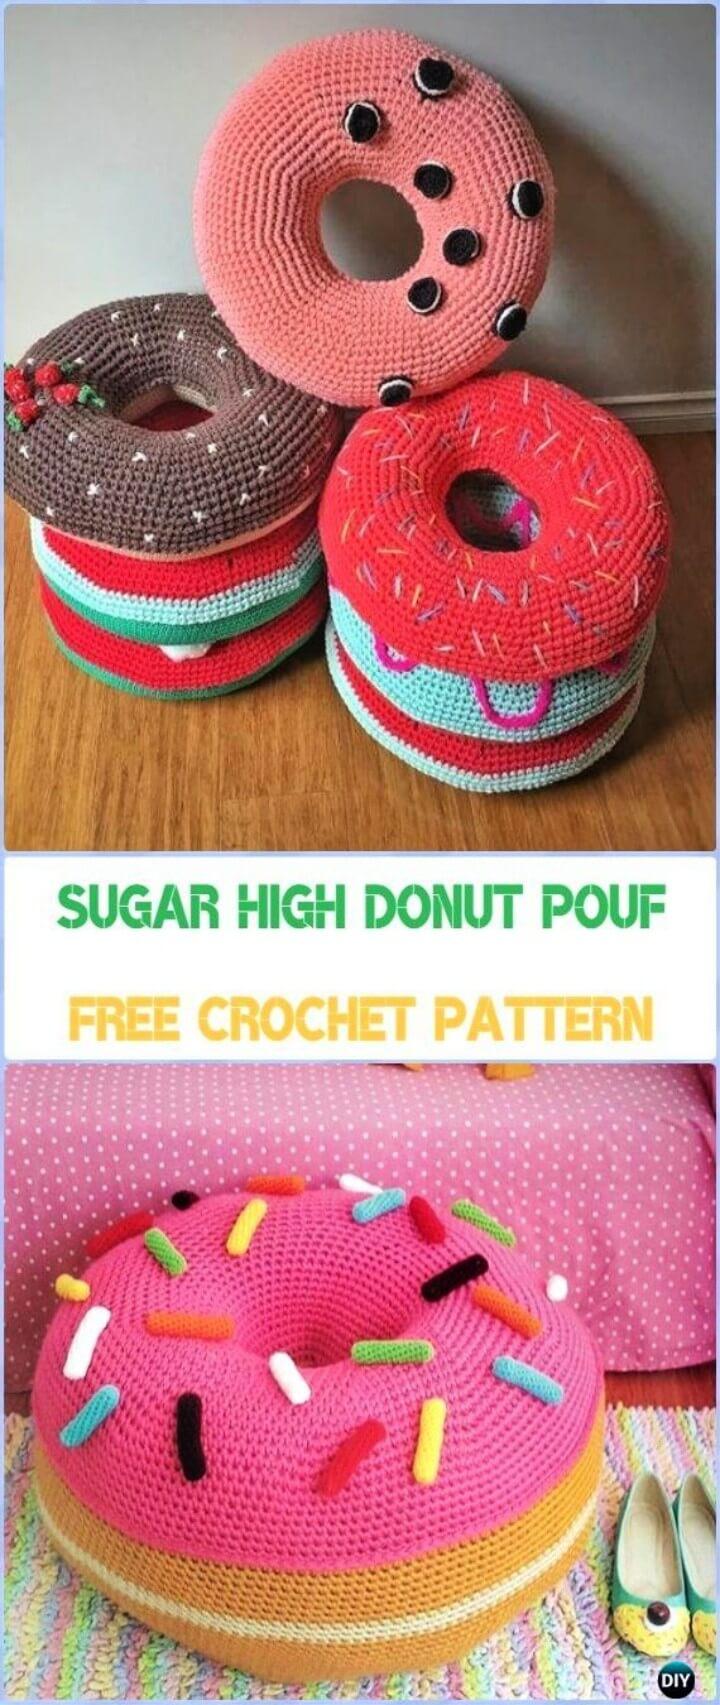 Sugar High Donut Pouf